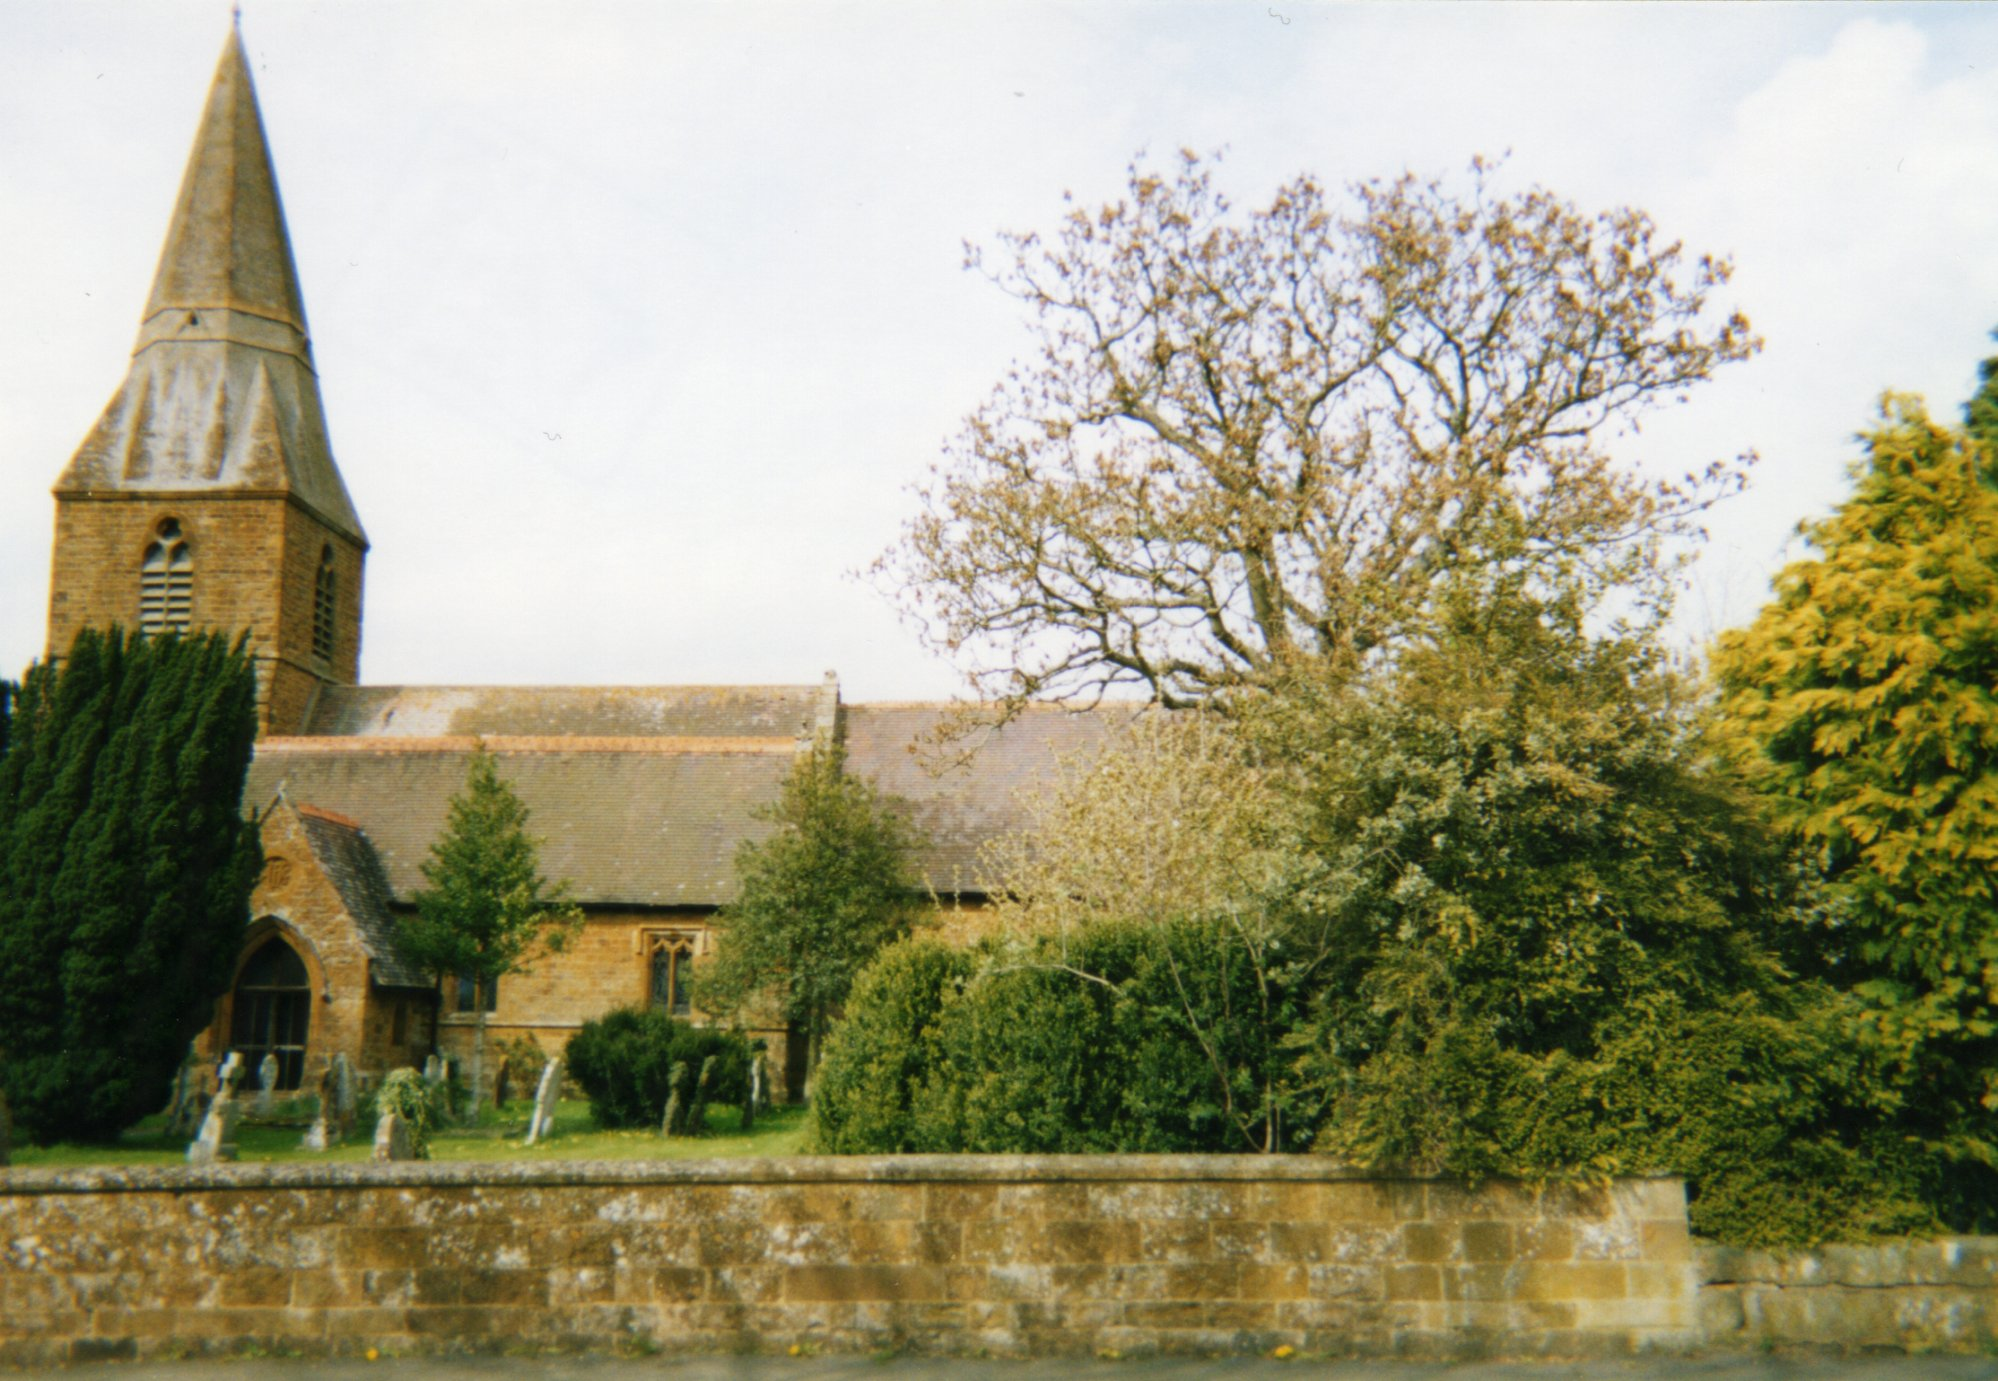 St. Peter's Radway